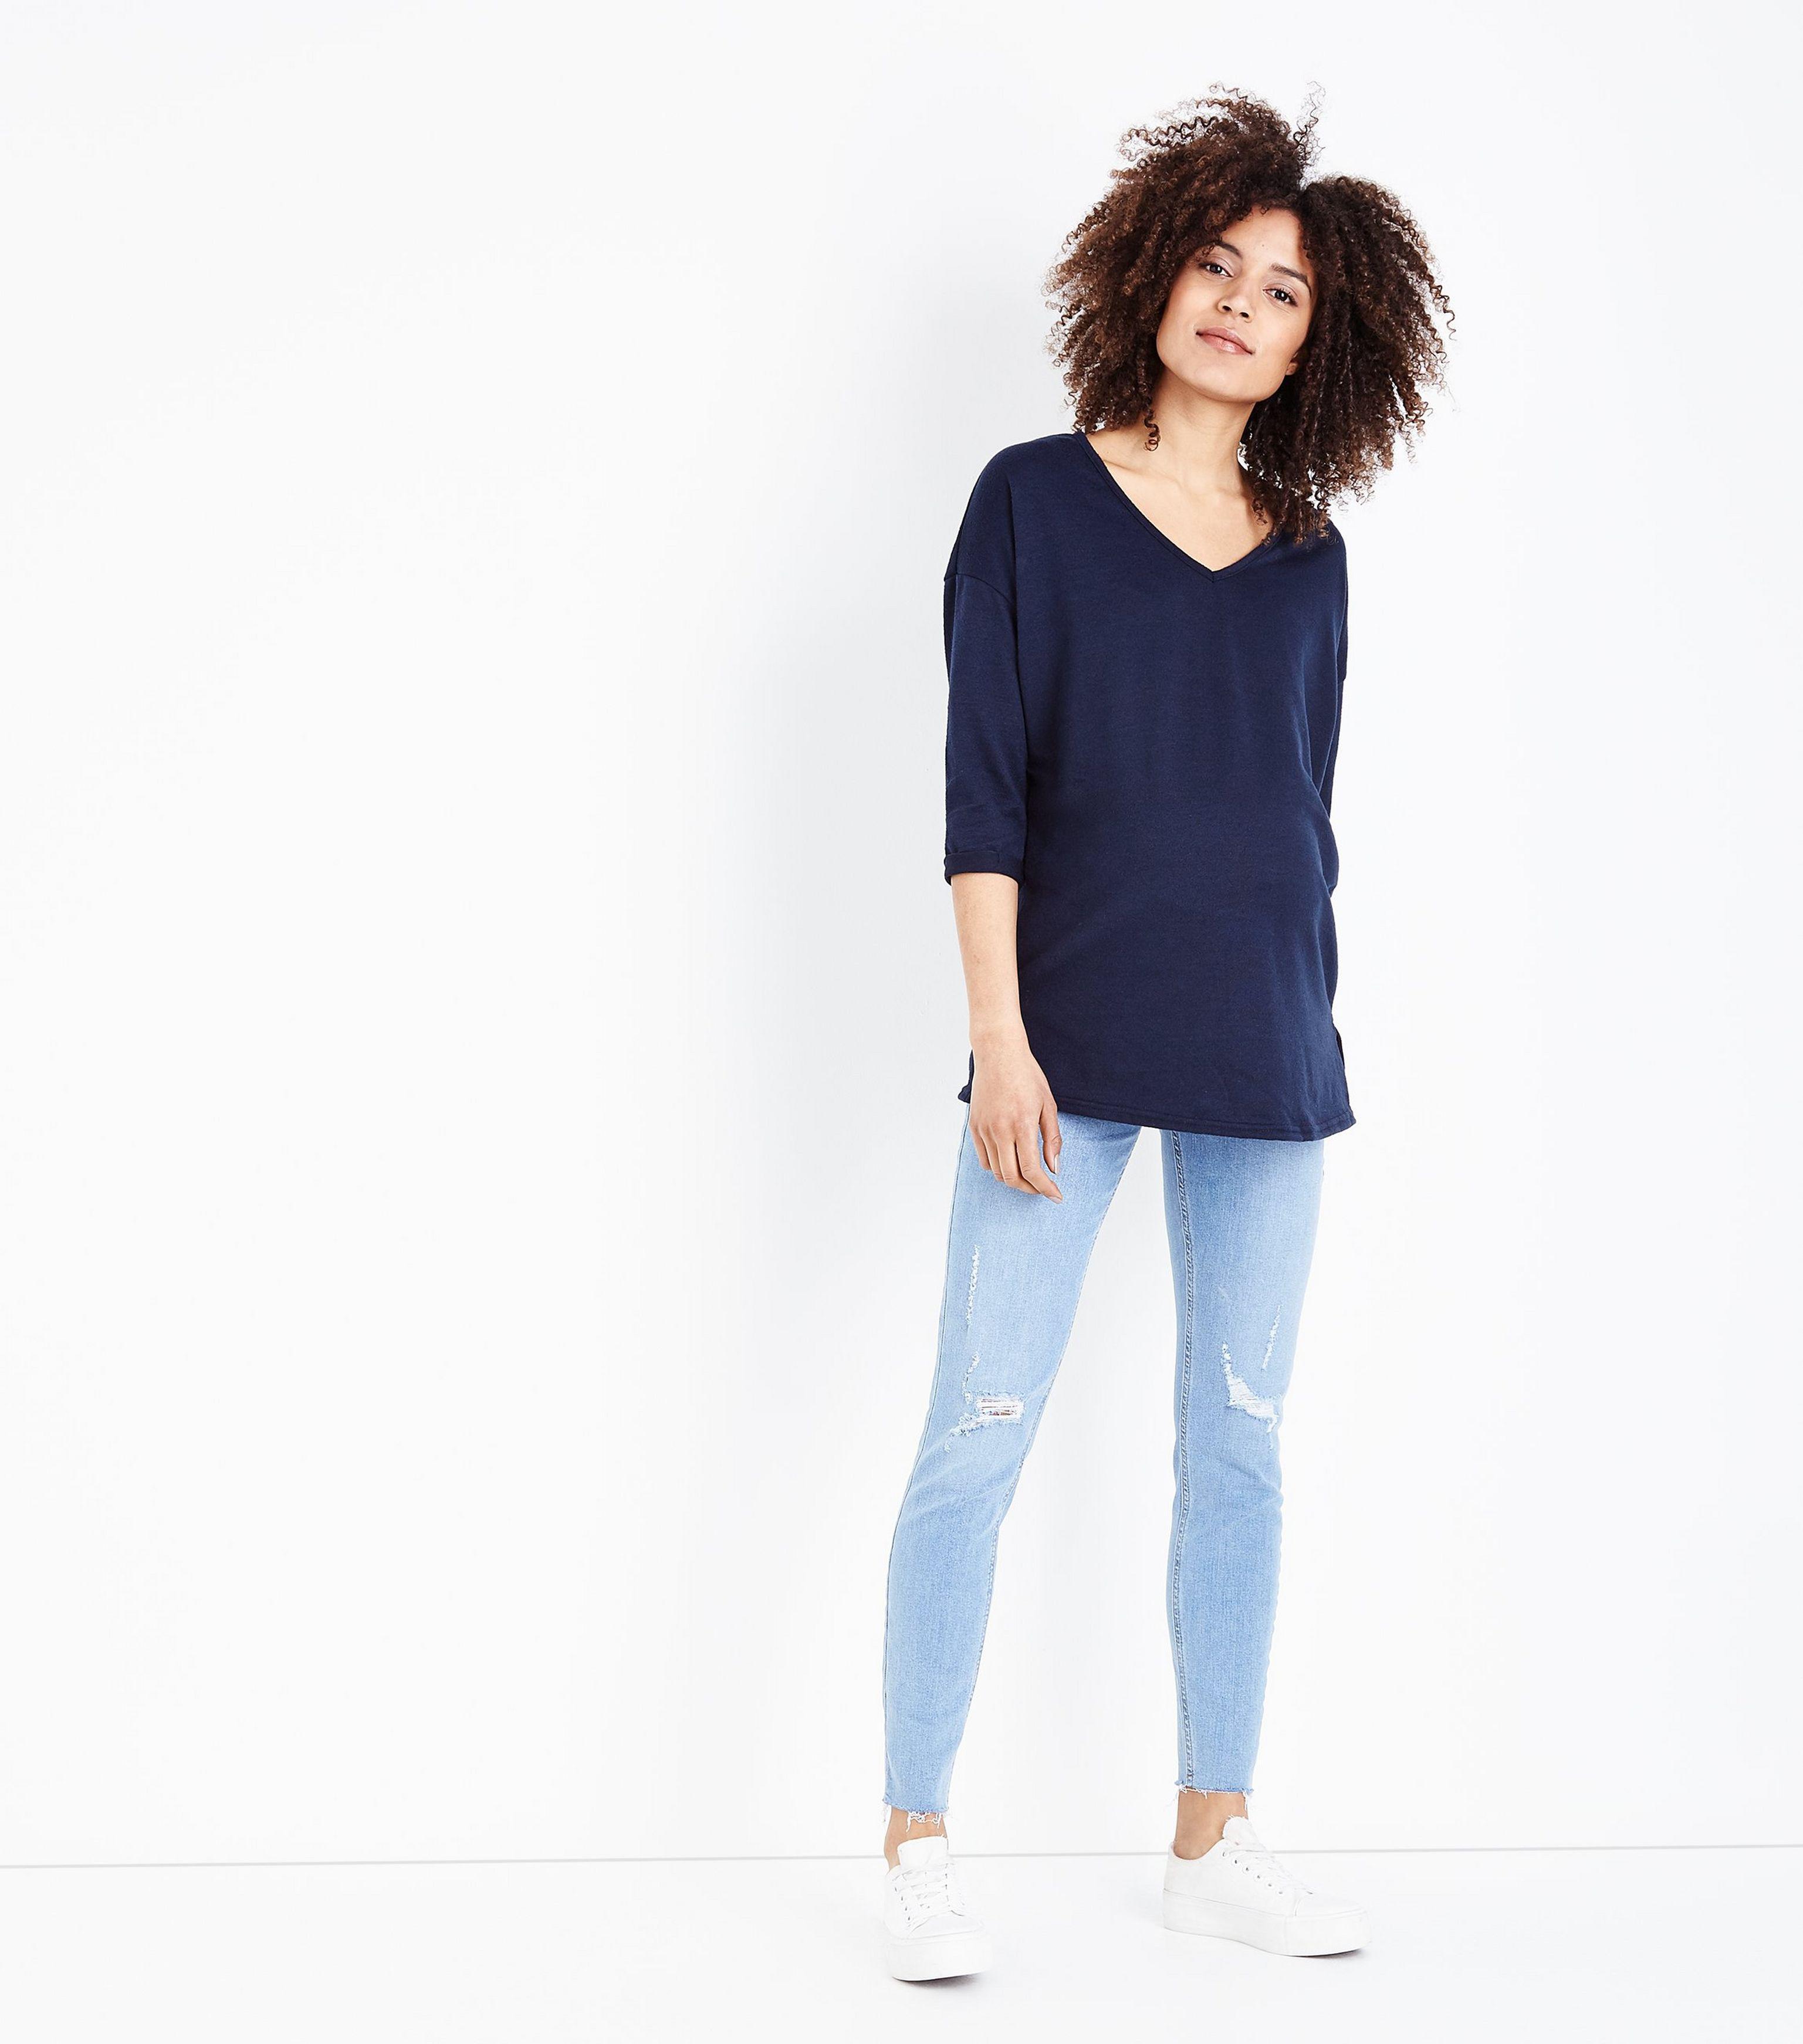 c024e3c82fbbe New Look Maternity Pale Blue Ripped Raw Hem Under Bump Skinny Jeans ...